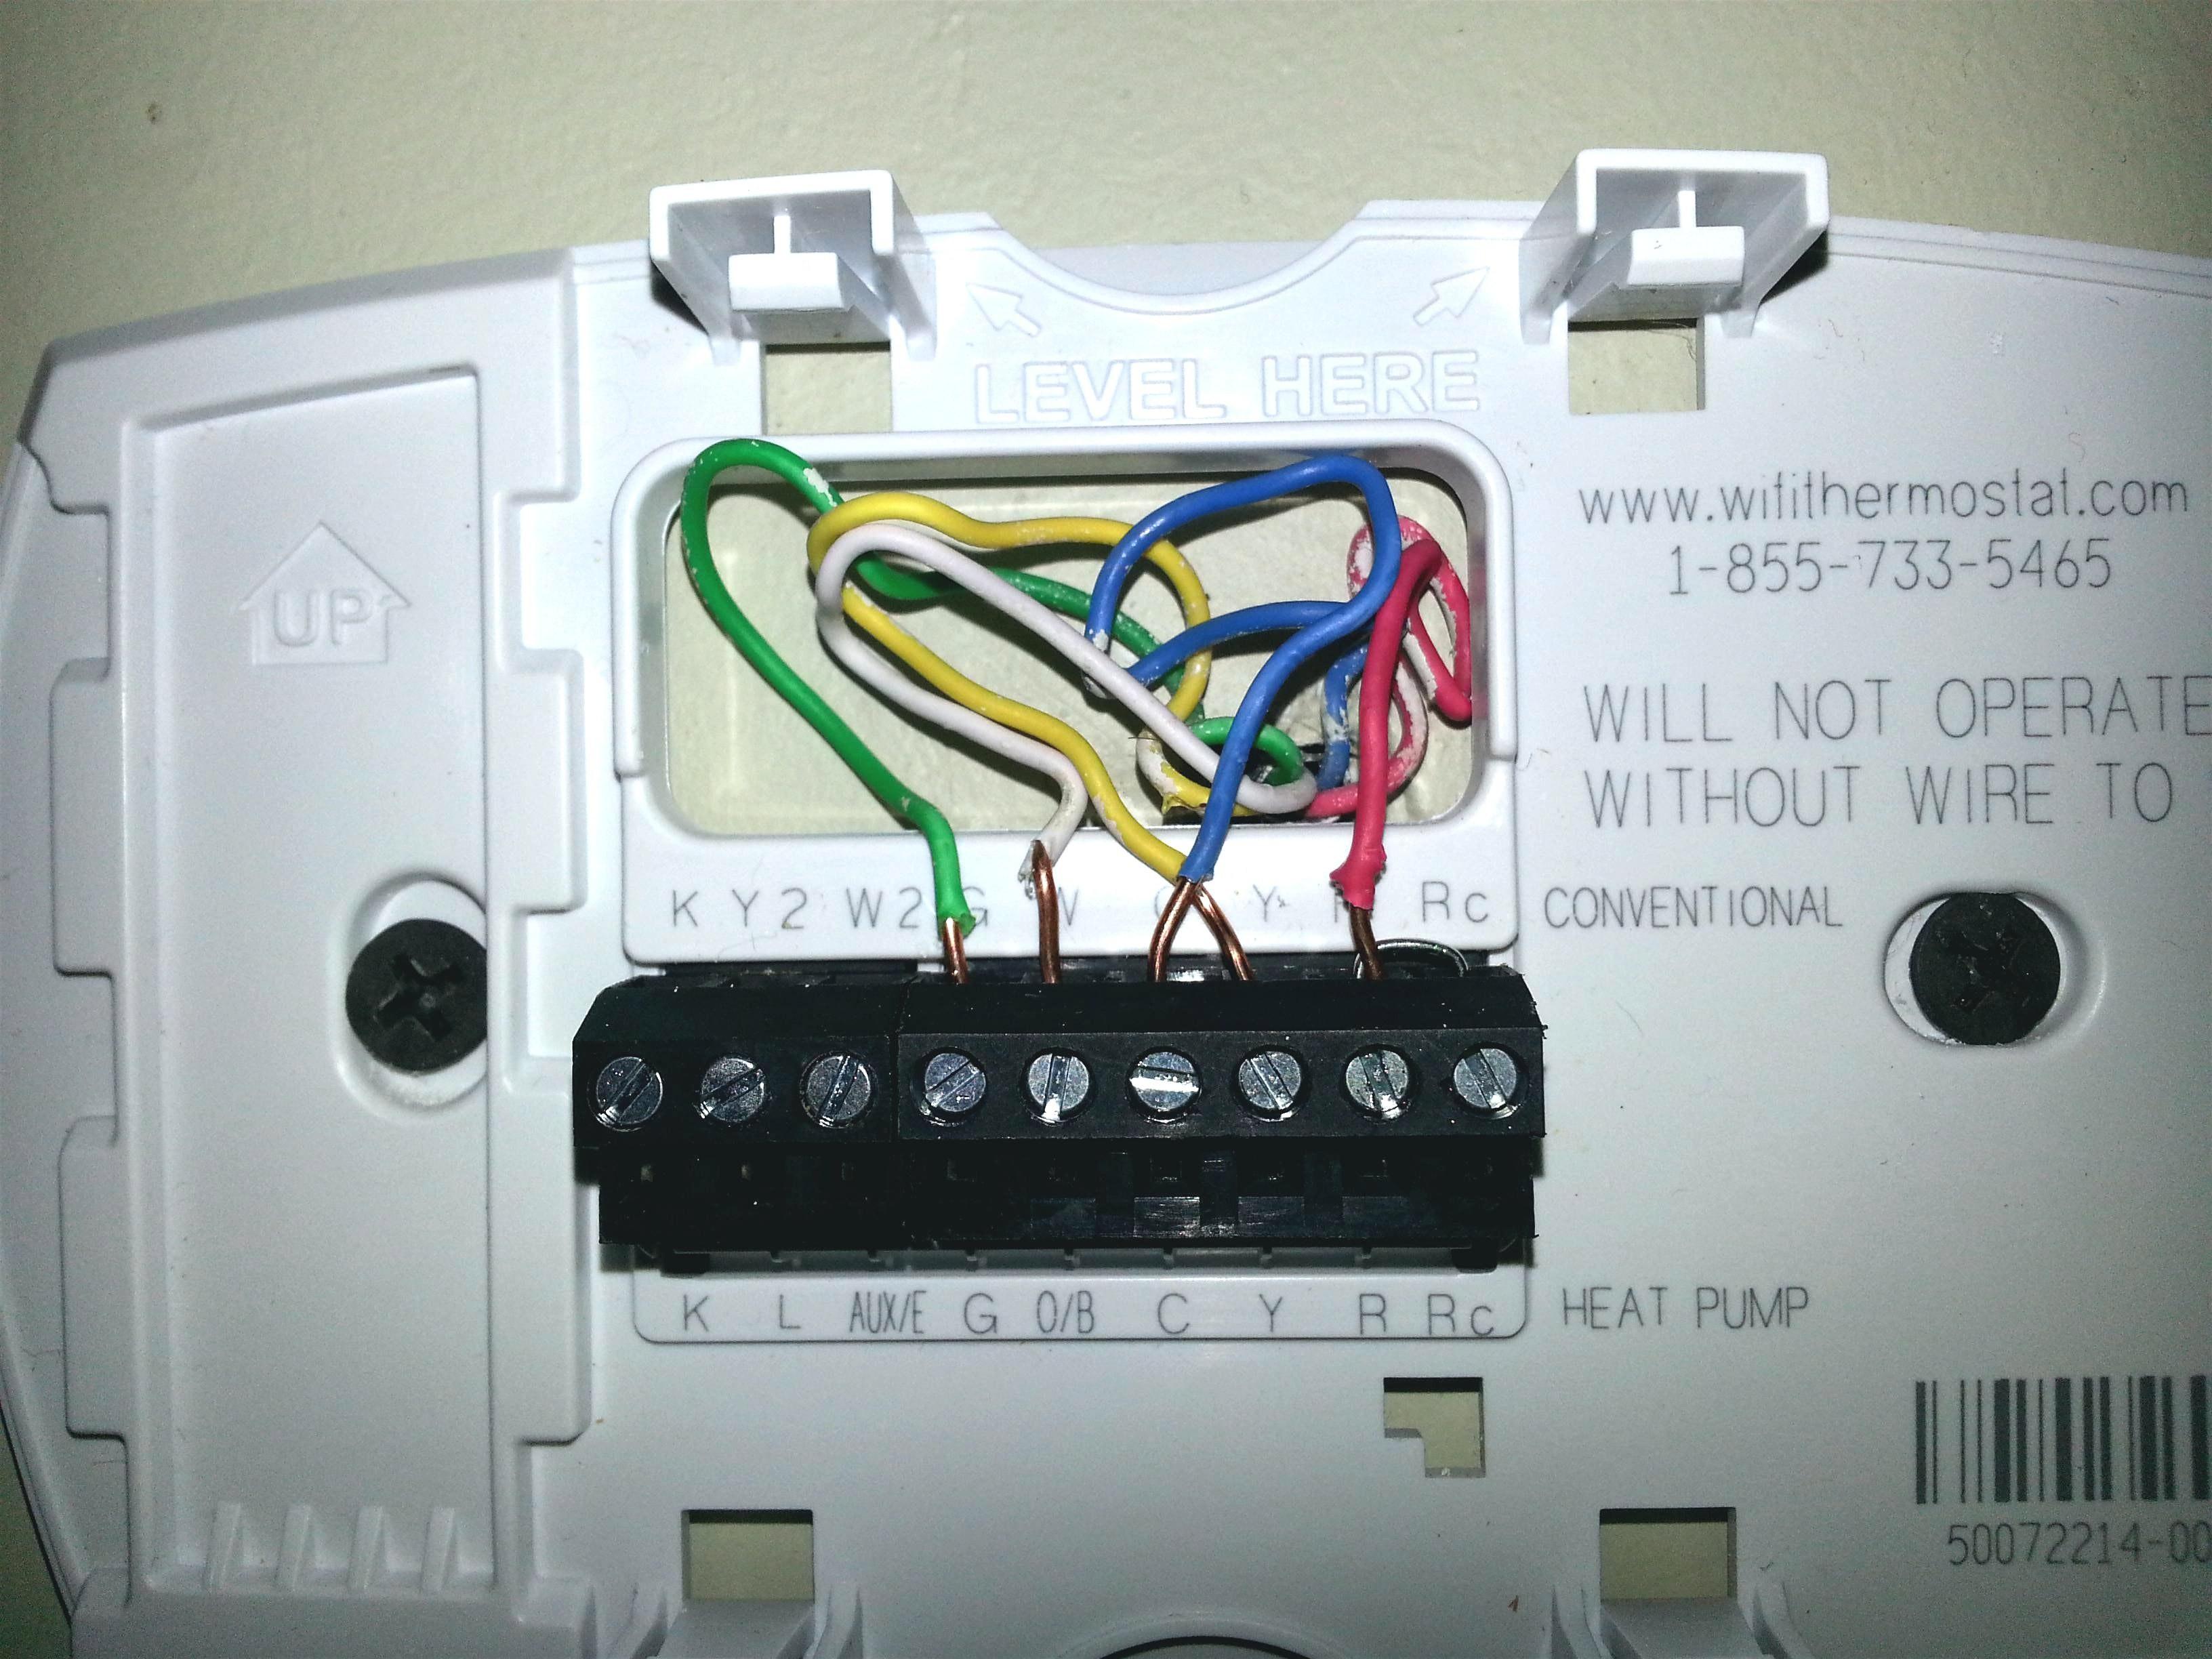 Lux 1500 Thermostat Wiring Diagram | Wiring Liry  Wire Thermostat Wiring Diagram Emerson on